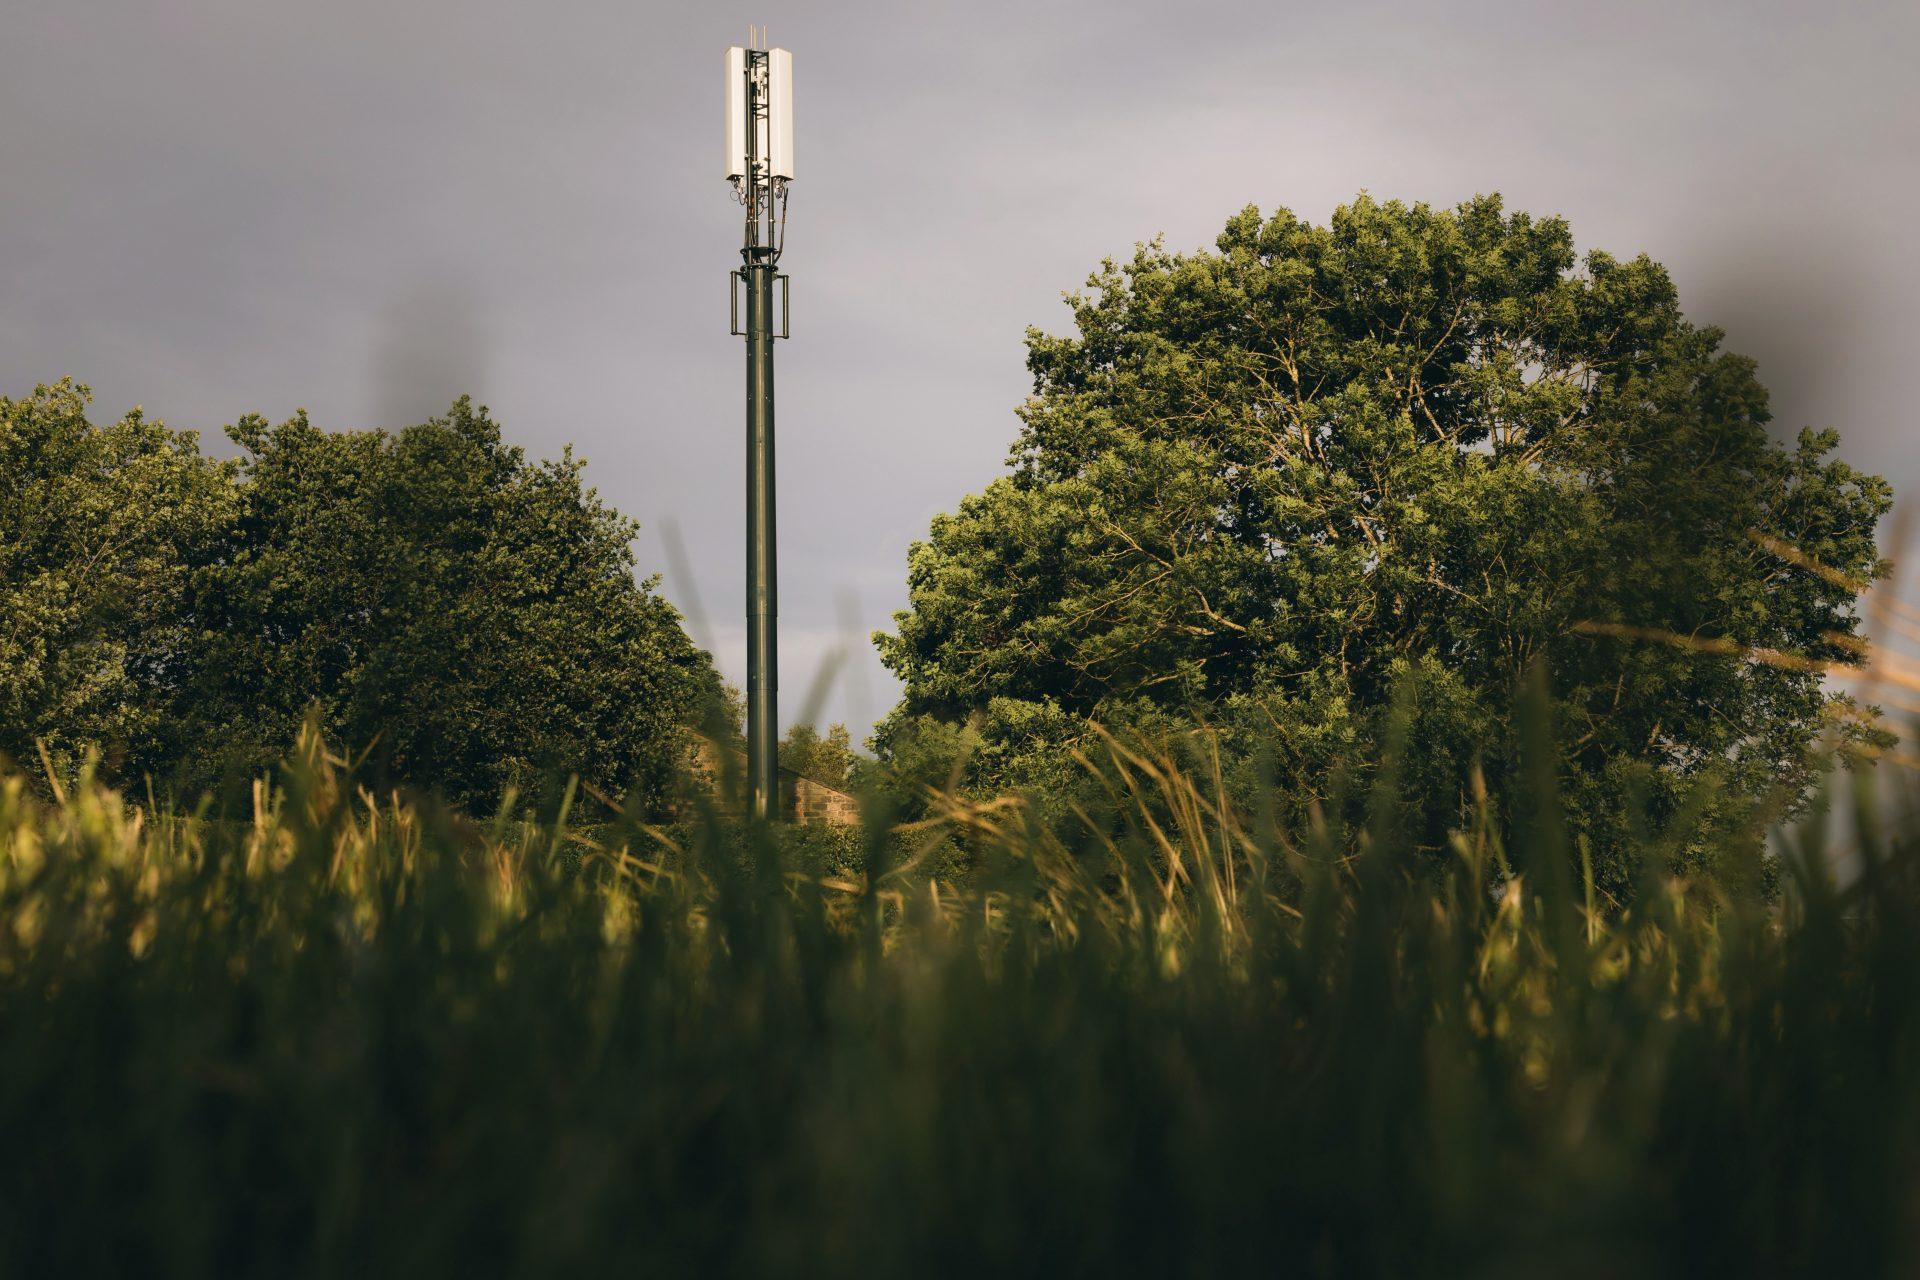 photo of Vodafone's SRN mast in Longnor